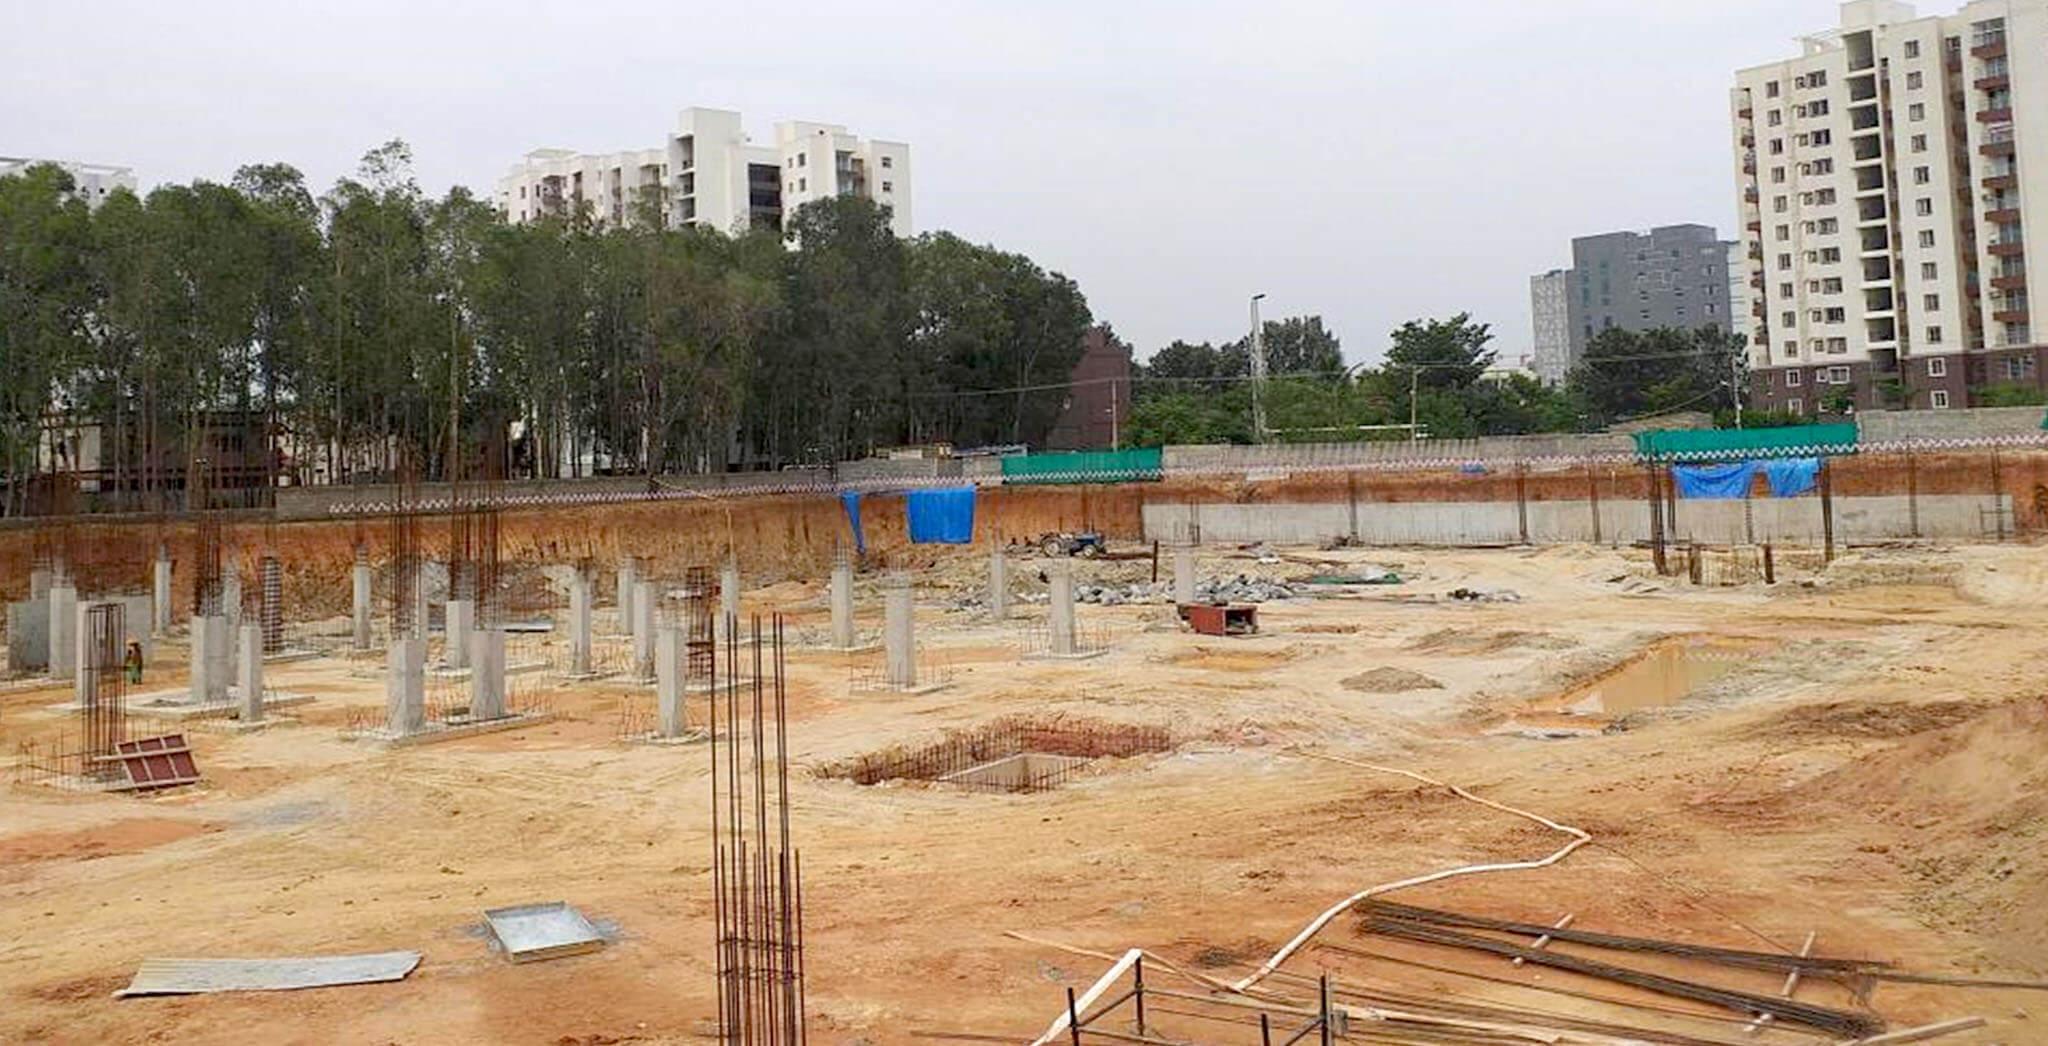 Jun 2019 - East side view